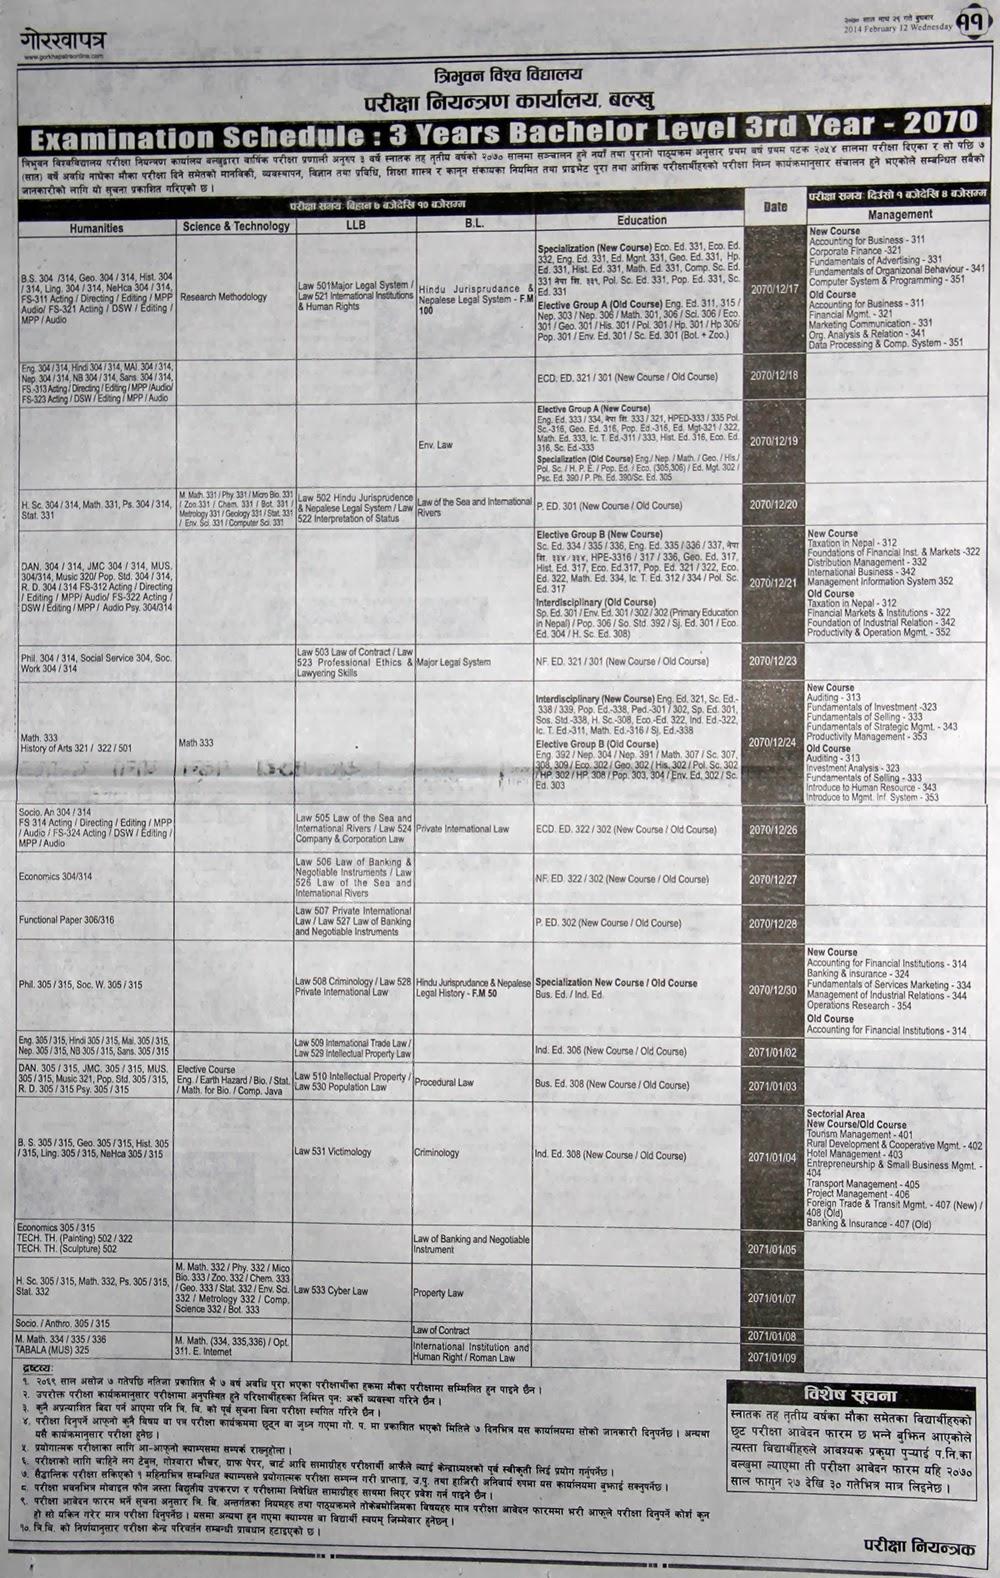 Schedule: 3 years Bachelor Level 3rd Year 2070 Tribhuvan University